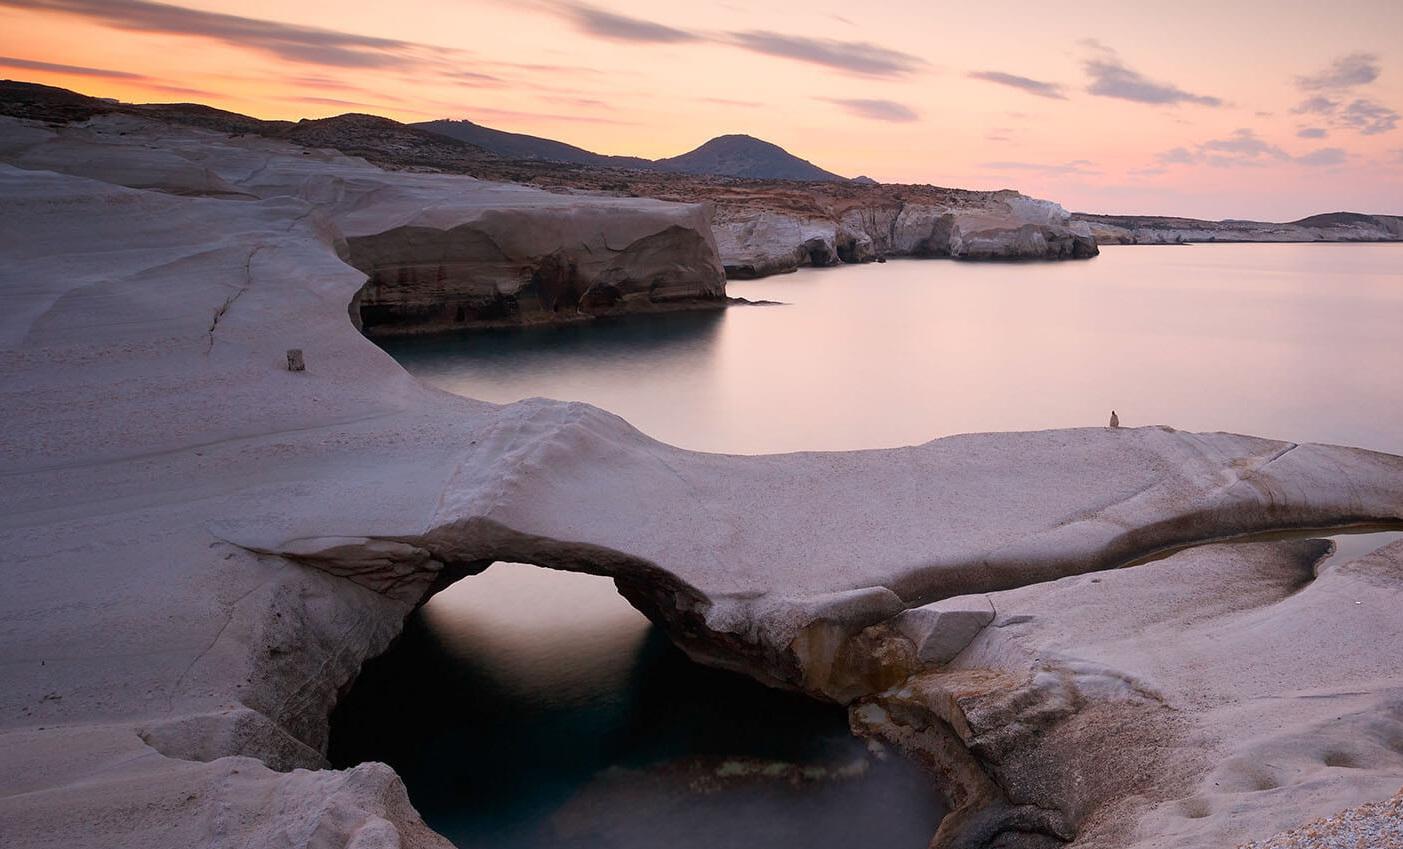 Milos (Greece)